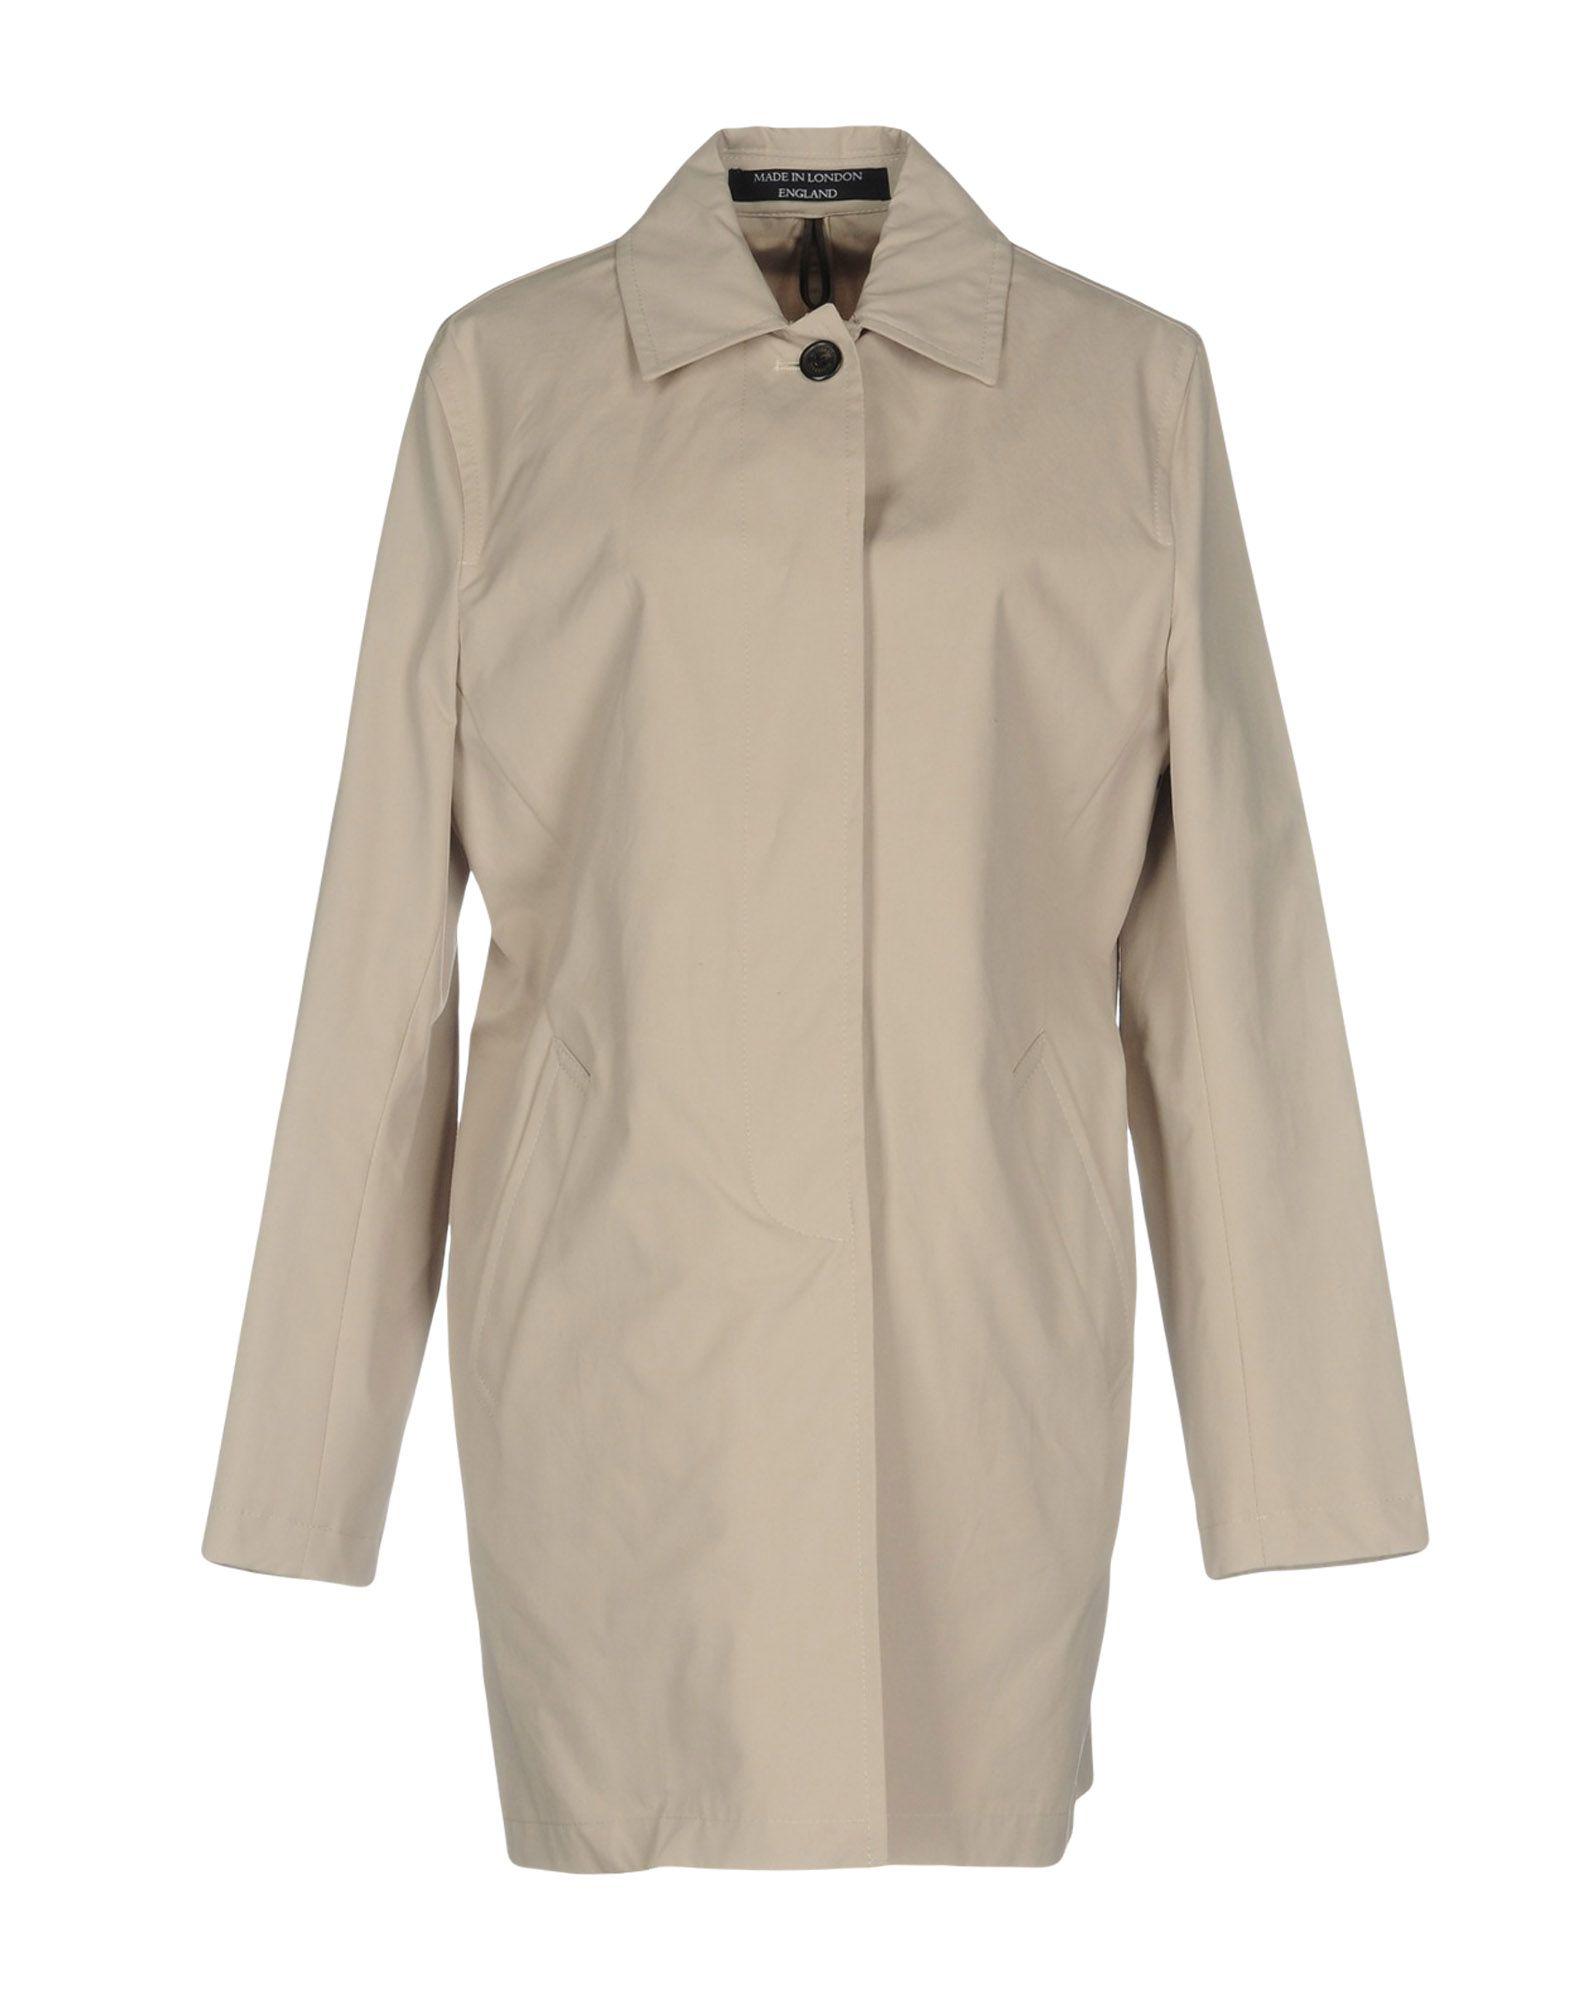 GLOVERALL Full-Length Jacket in Beige